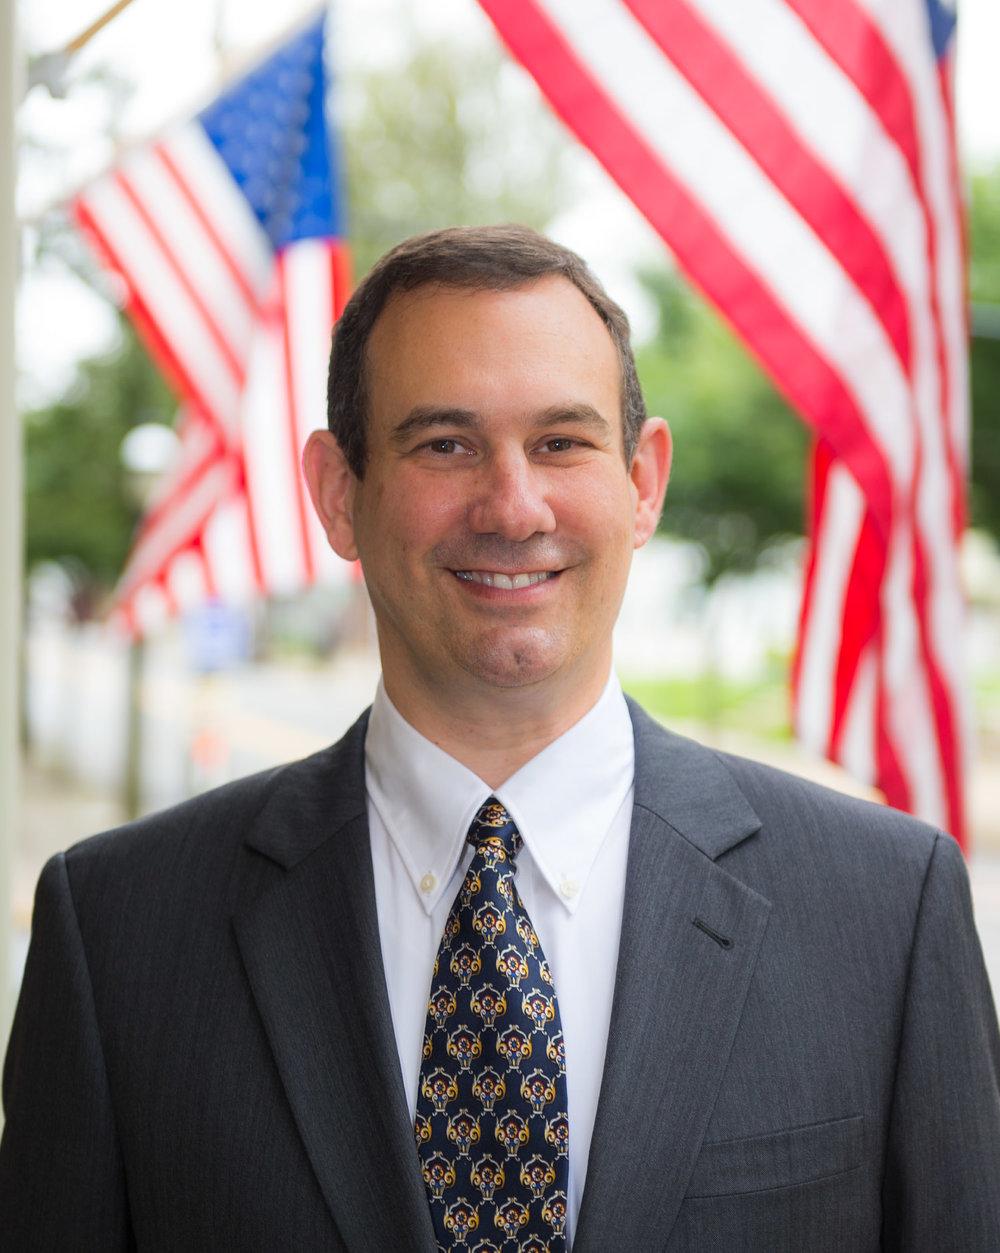 Mark-Pinsley-Lehigh-county-pennsylvania-Vote.jpg